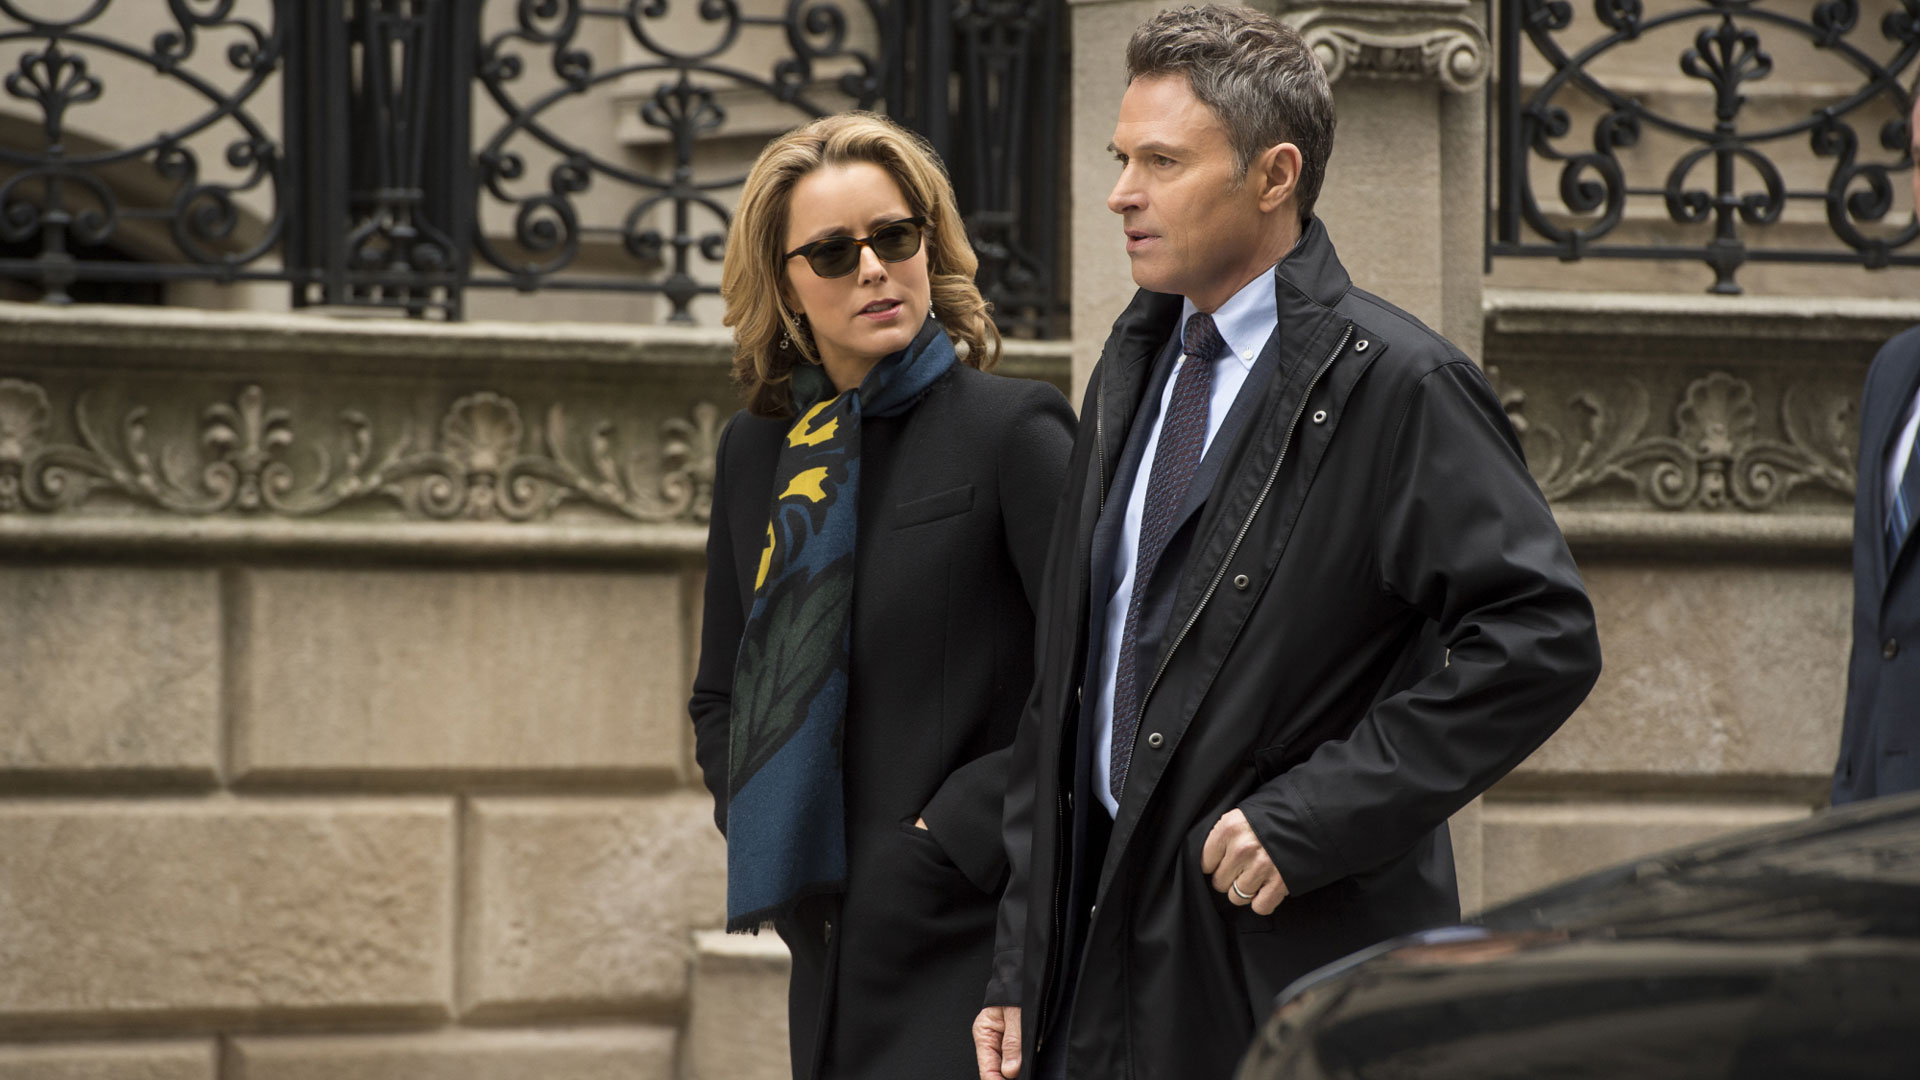 Madam Secretary boasts an Academy Award winning guest star.